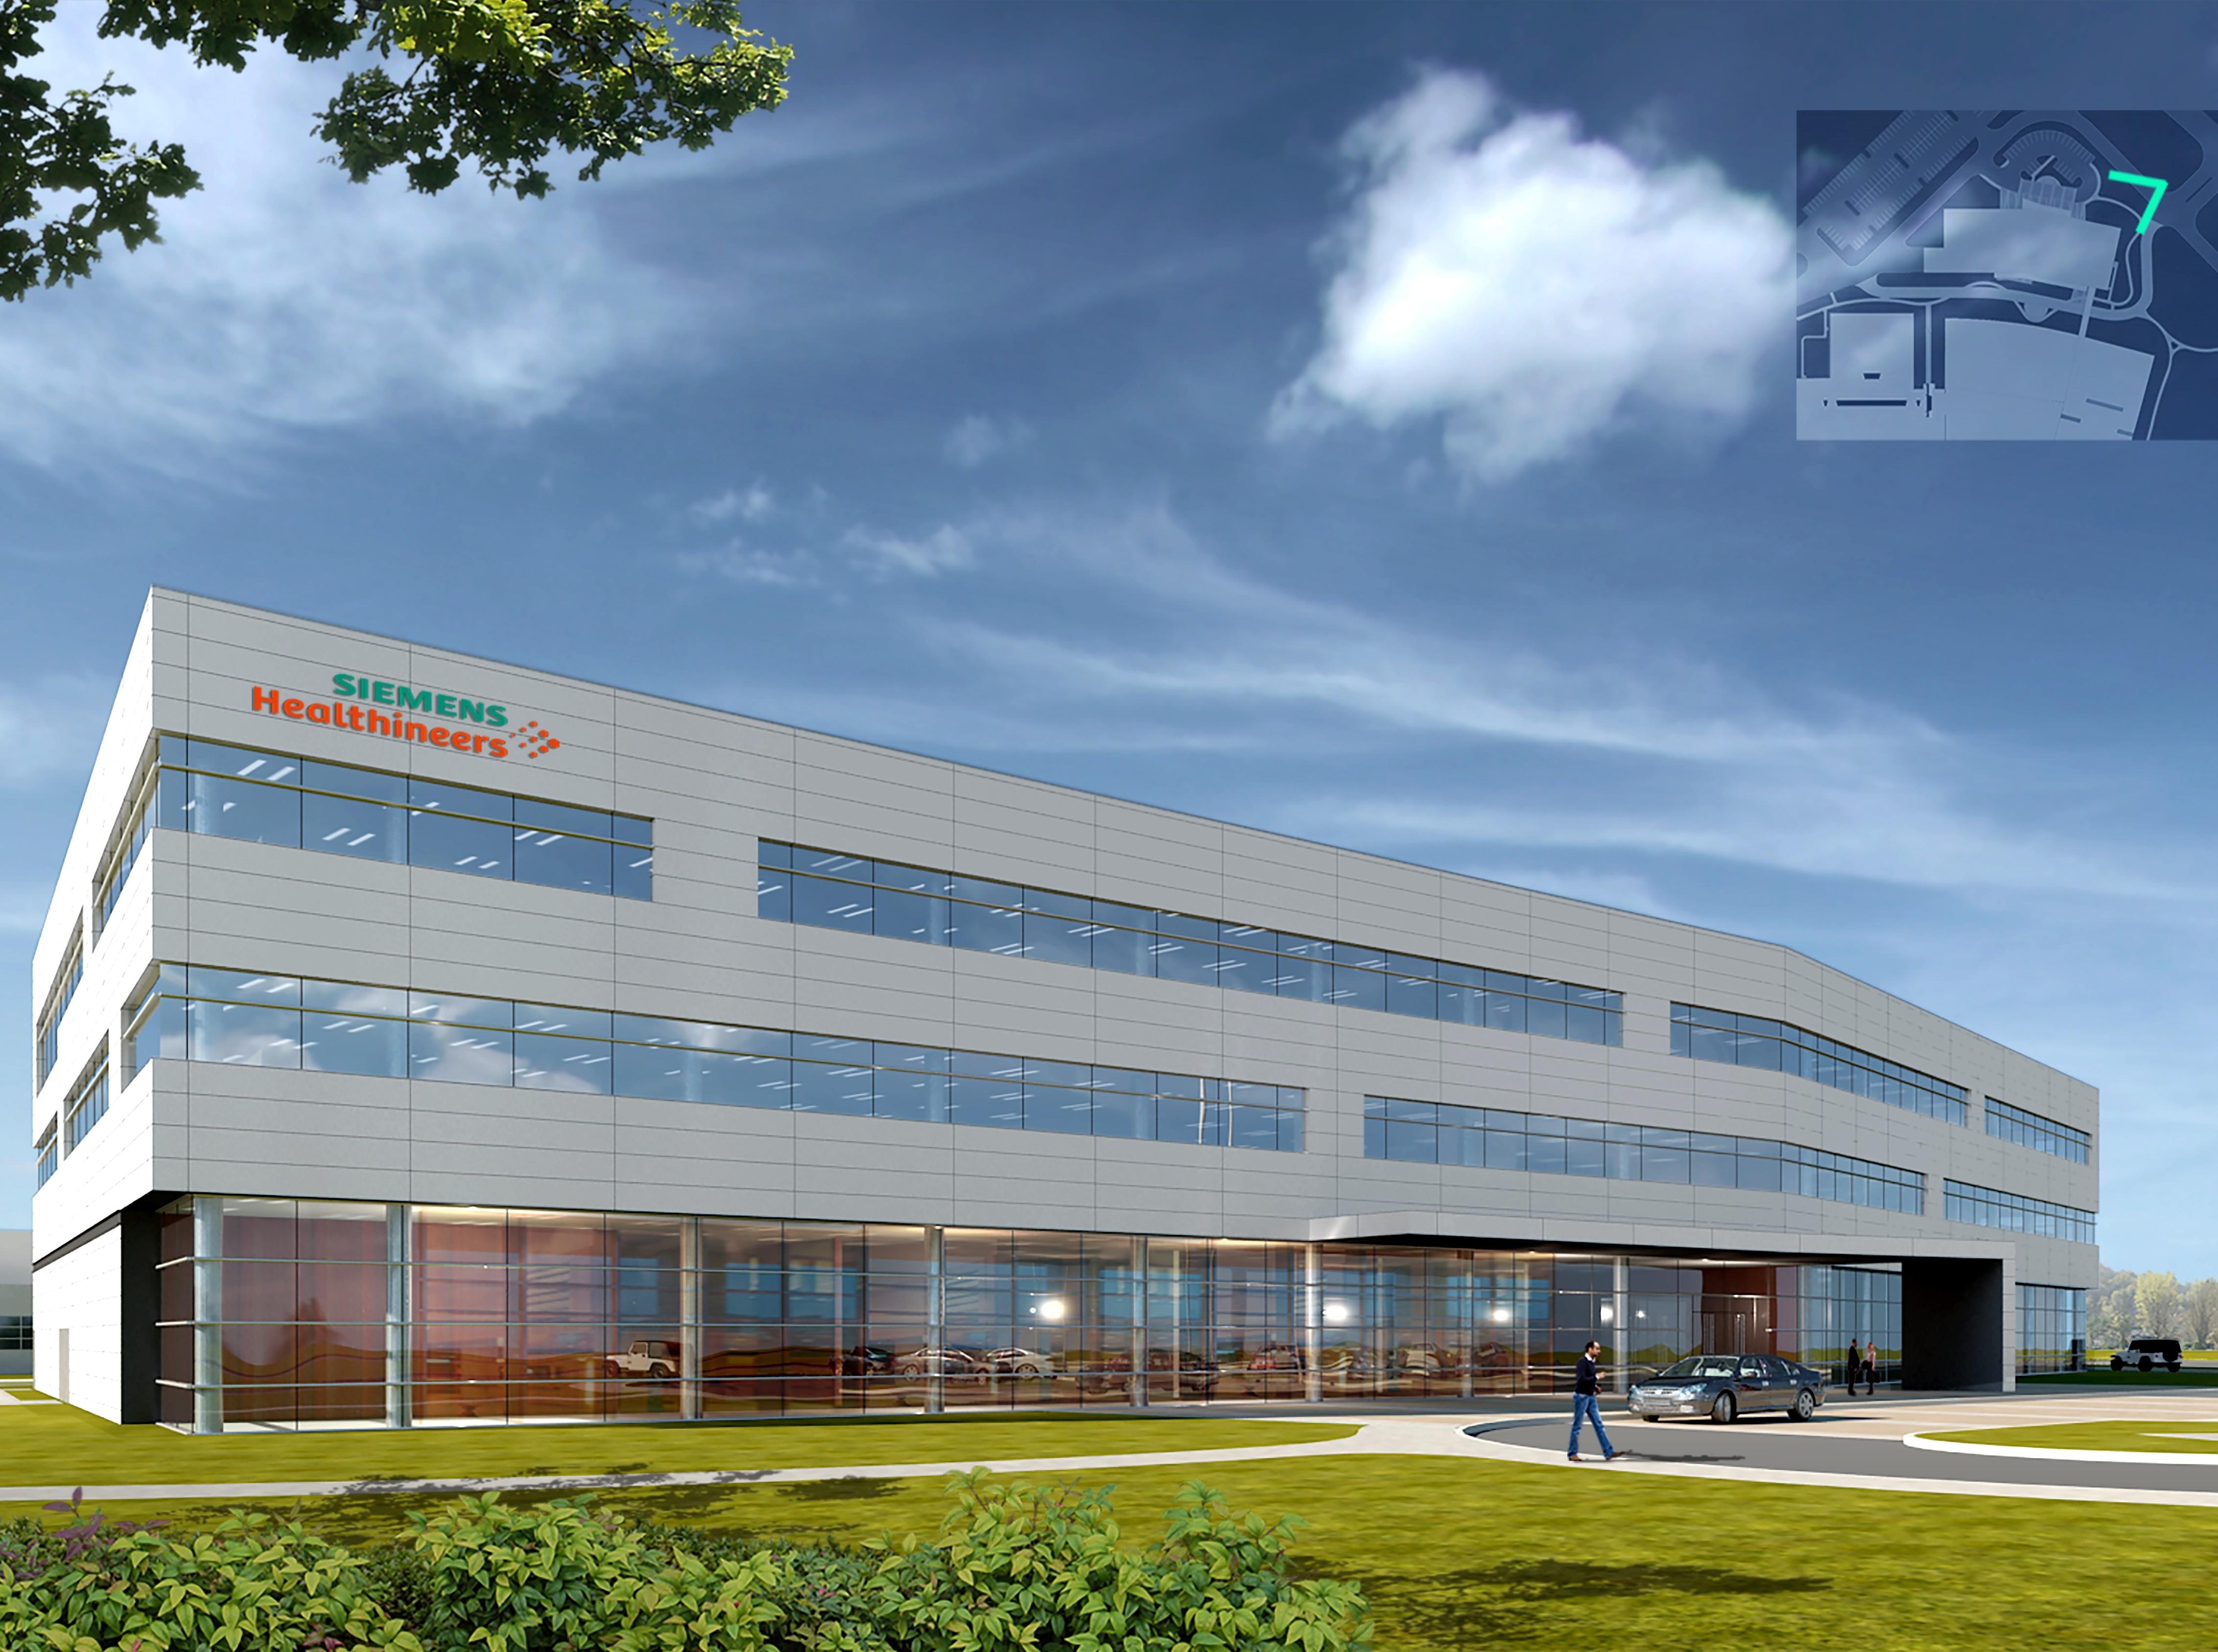 Siemens Healthineers, Walpole, Mass.